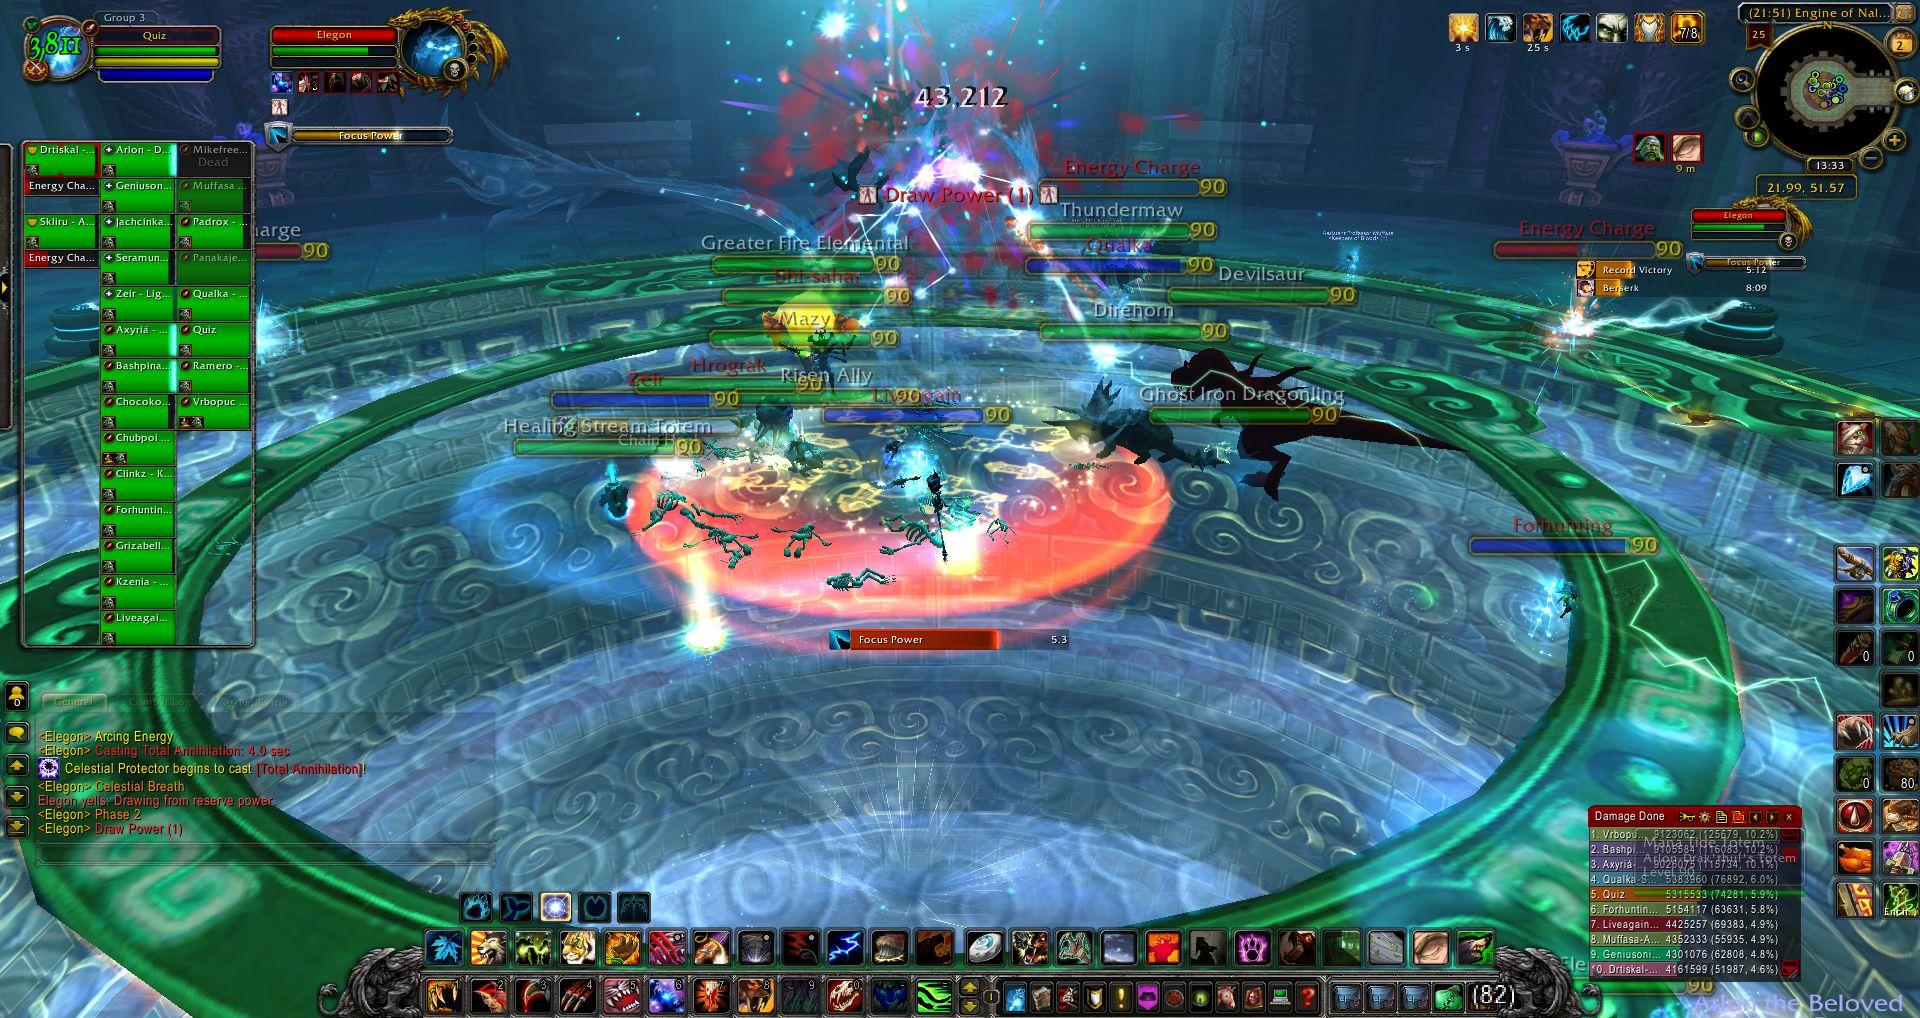 Elegon wow screenshot - Gamingcfg com